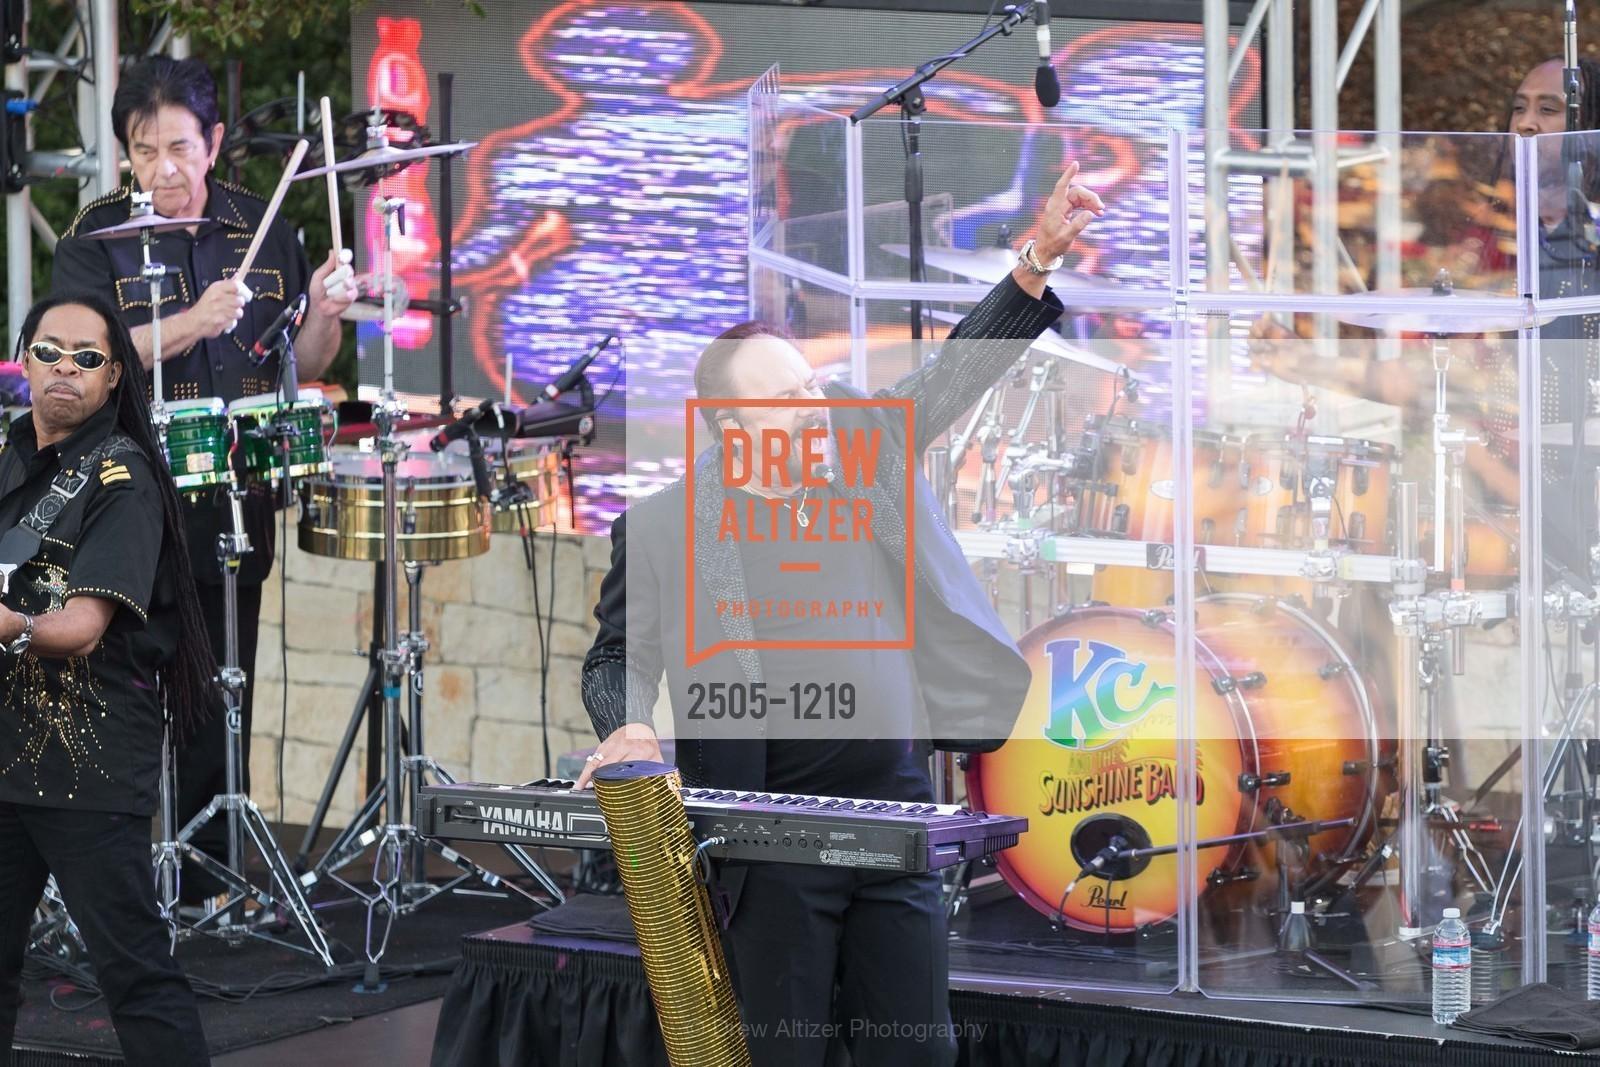 KC And The Sunshine Band, Photo #2505-1219